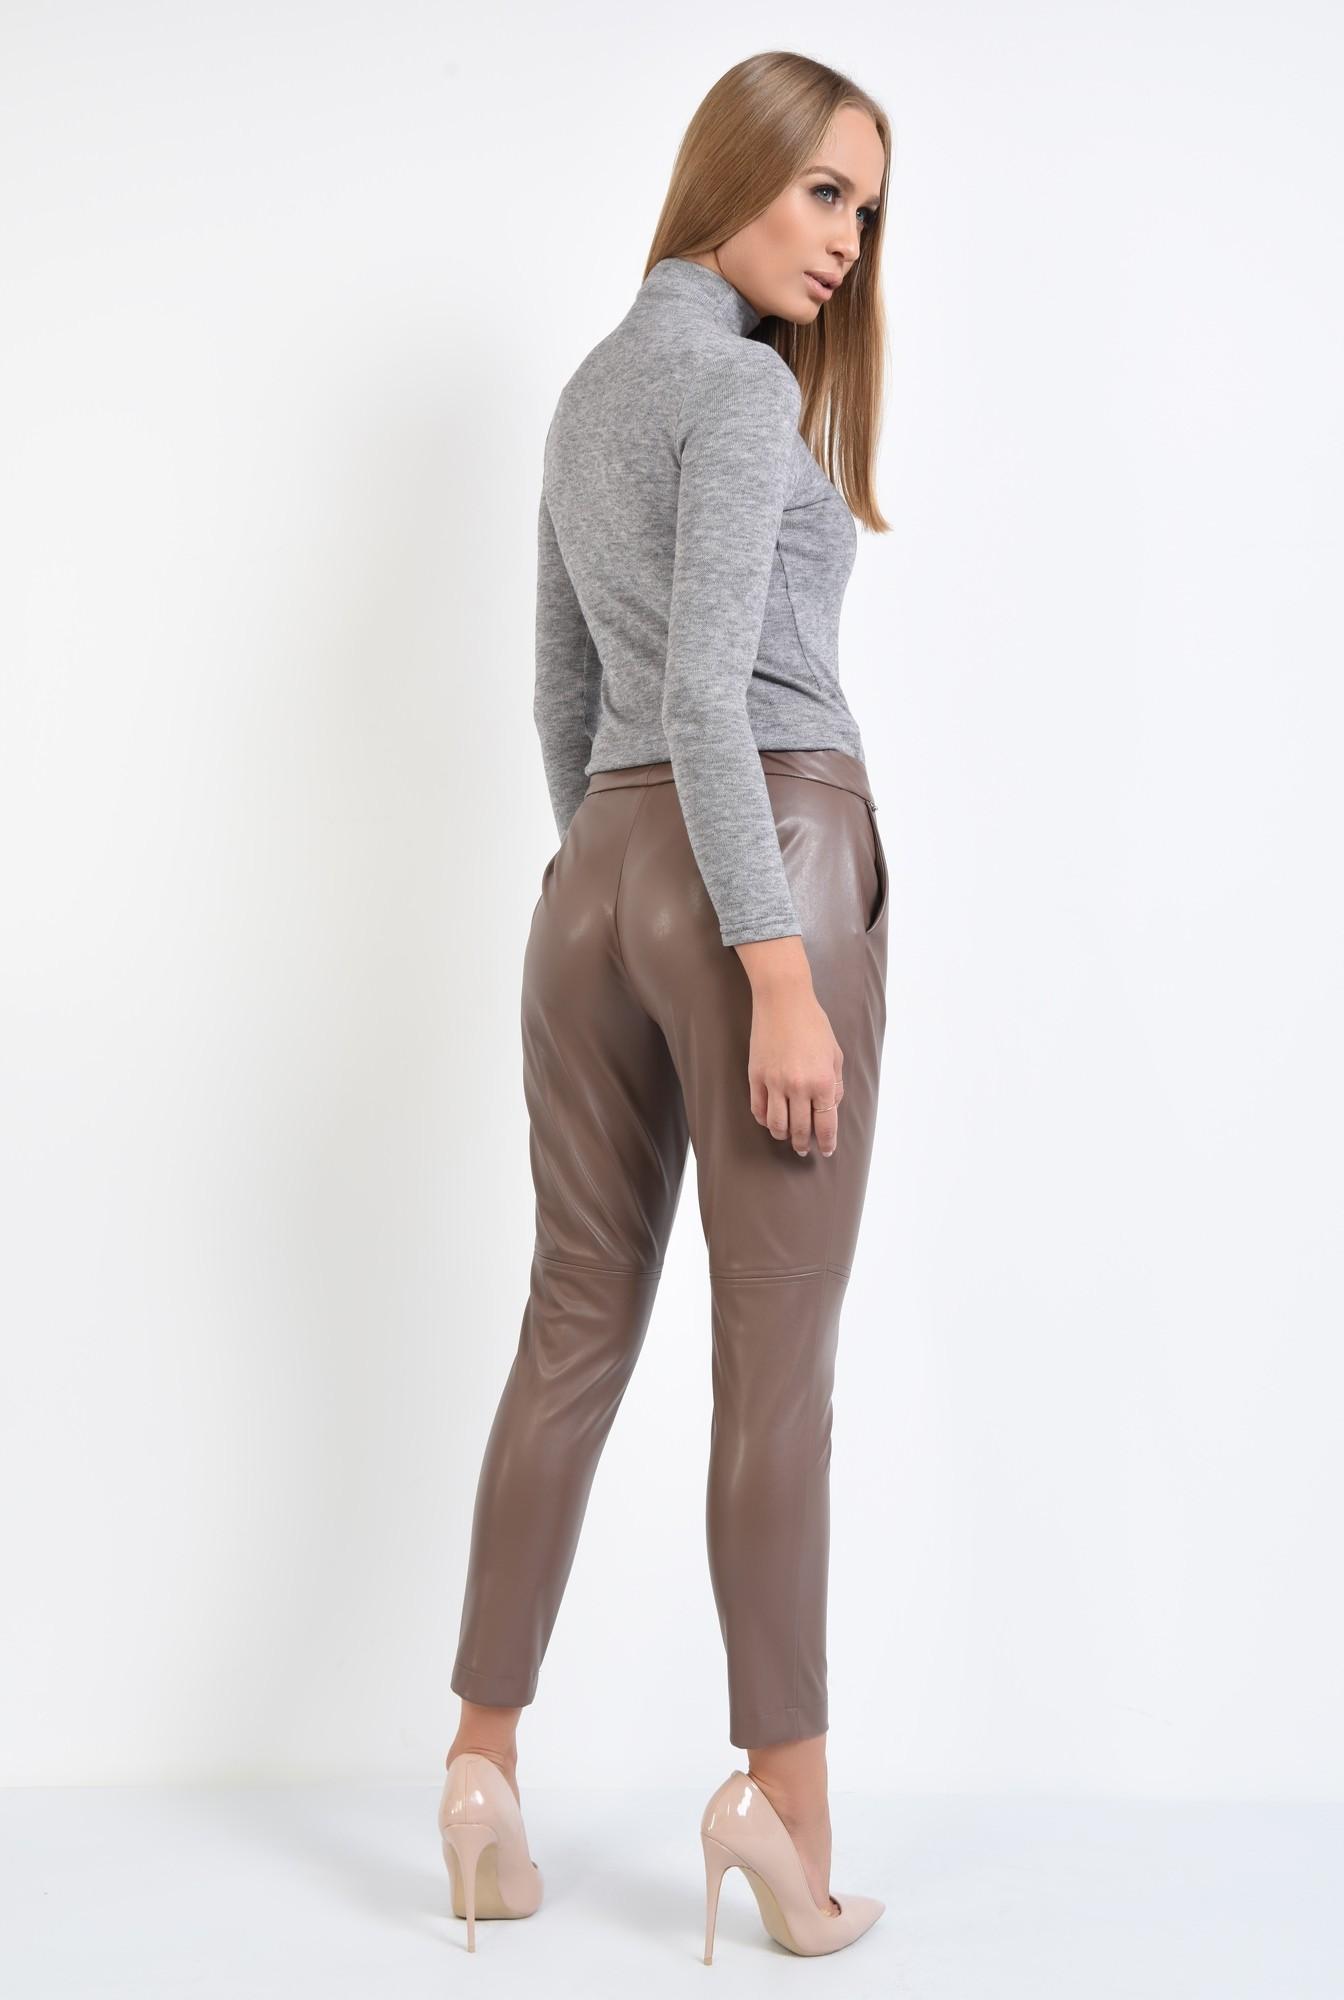 1 - pantaloni casual, pana, piele eco, talie medie